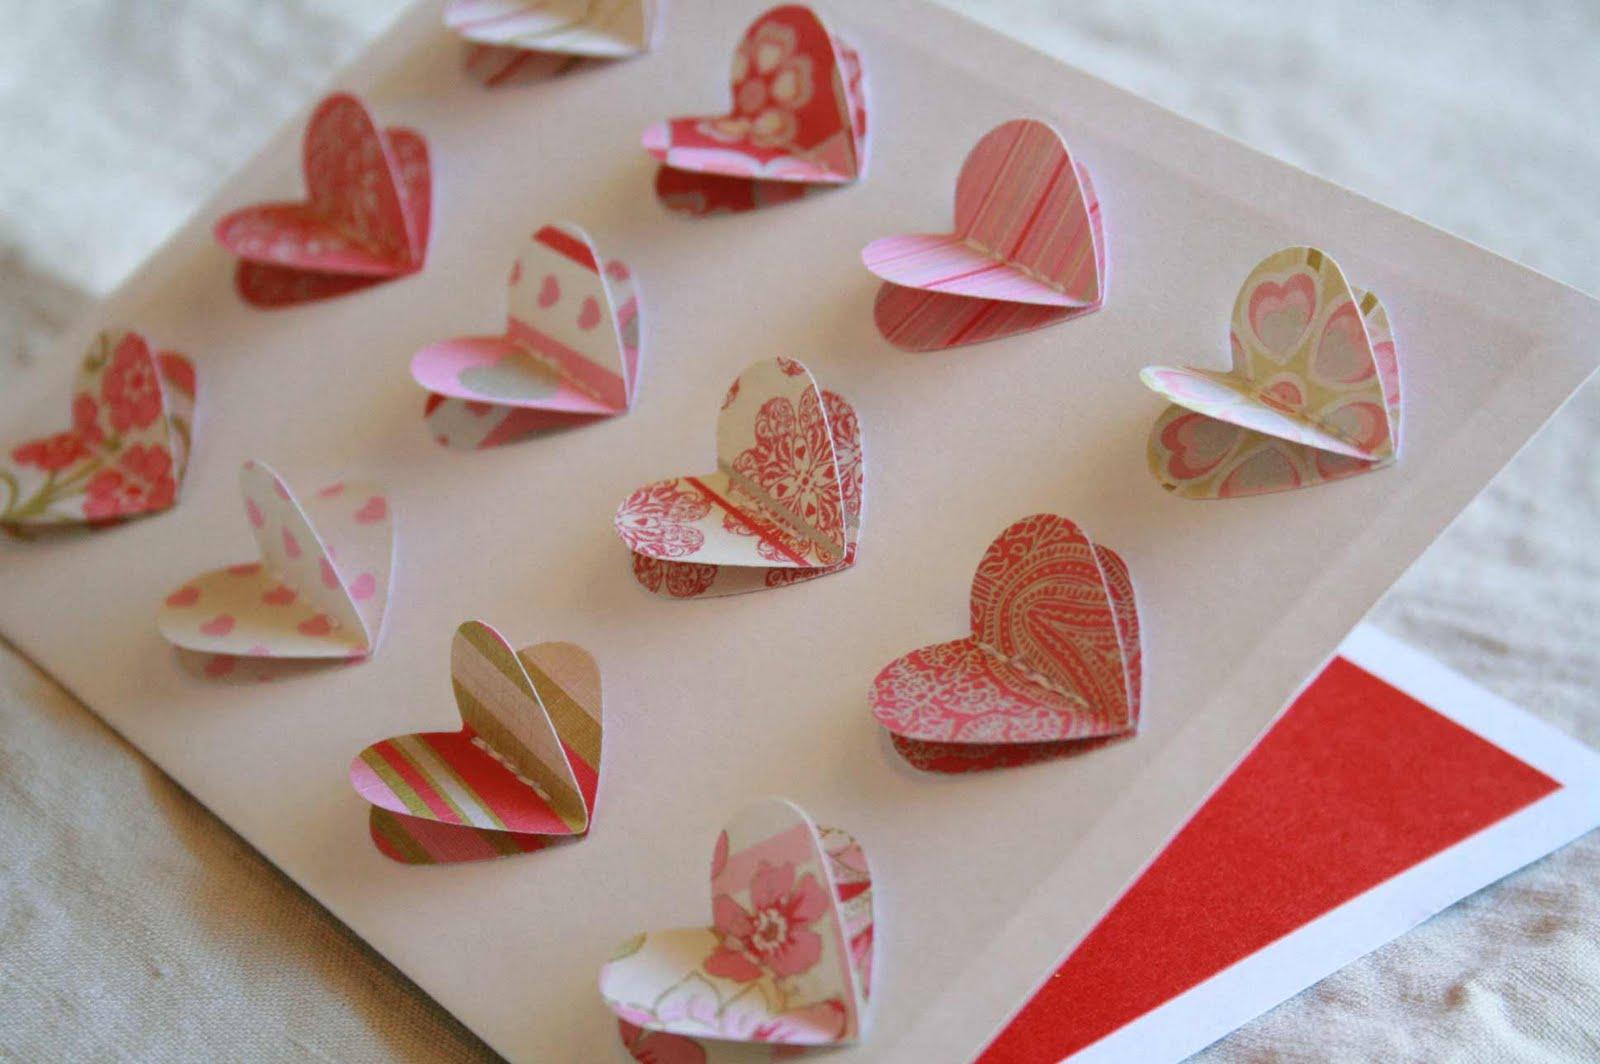 the creative place diy 3 d heart valentine card. Black Bedroom Furniture Sets. Home Design Ideas